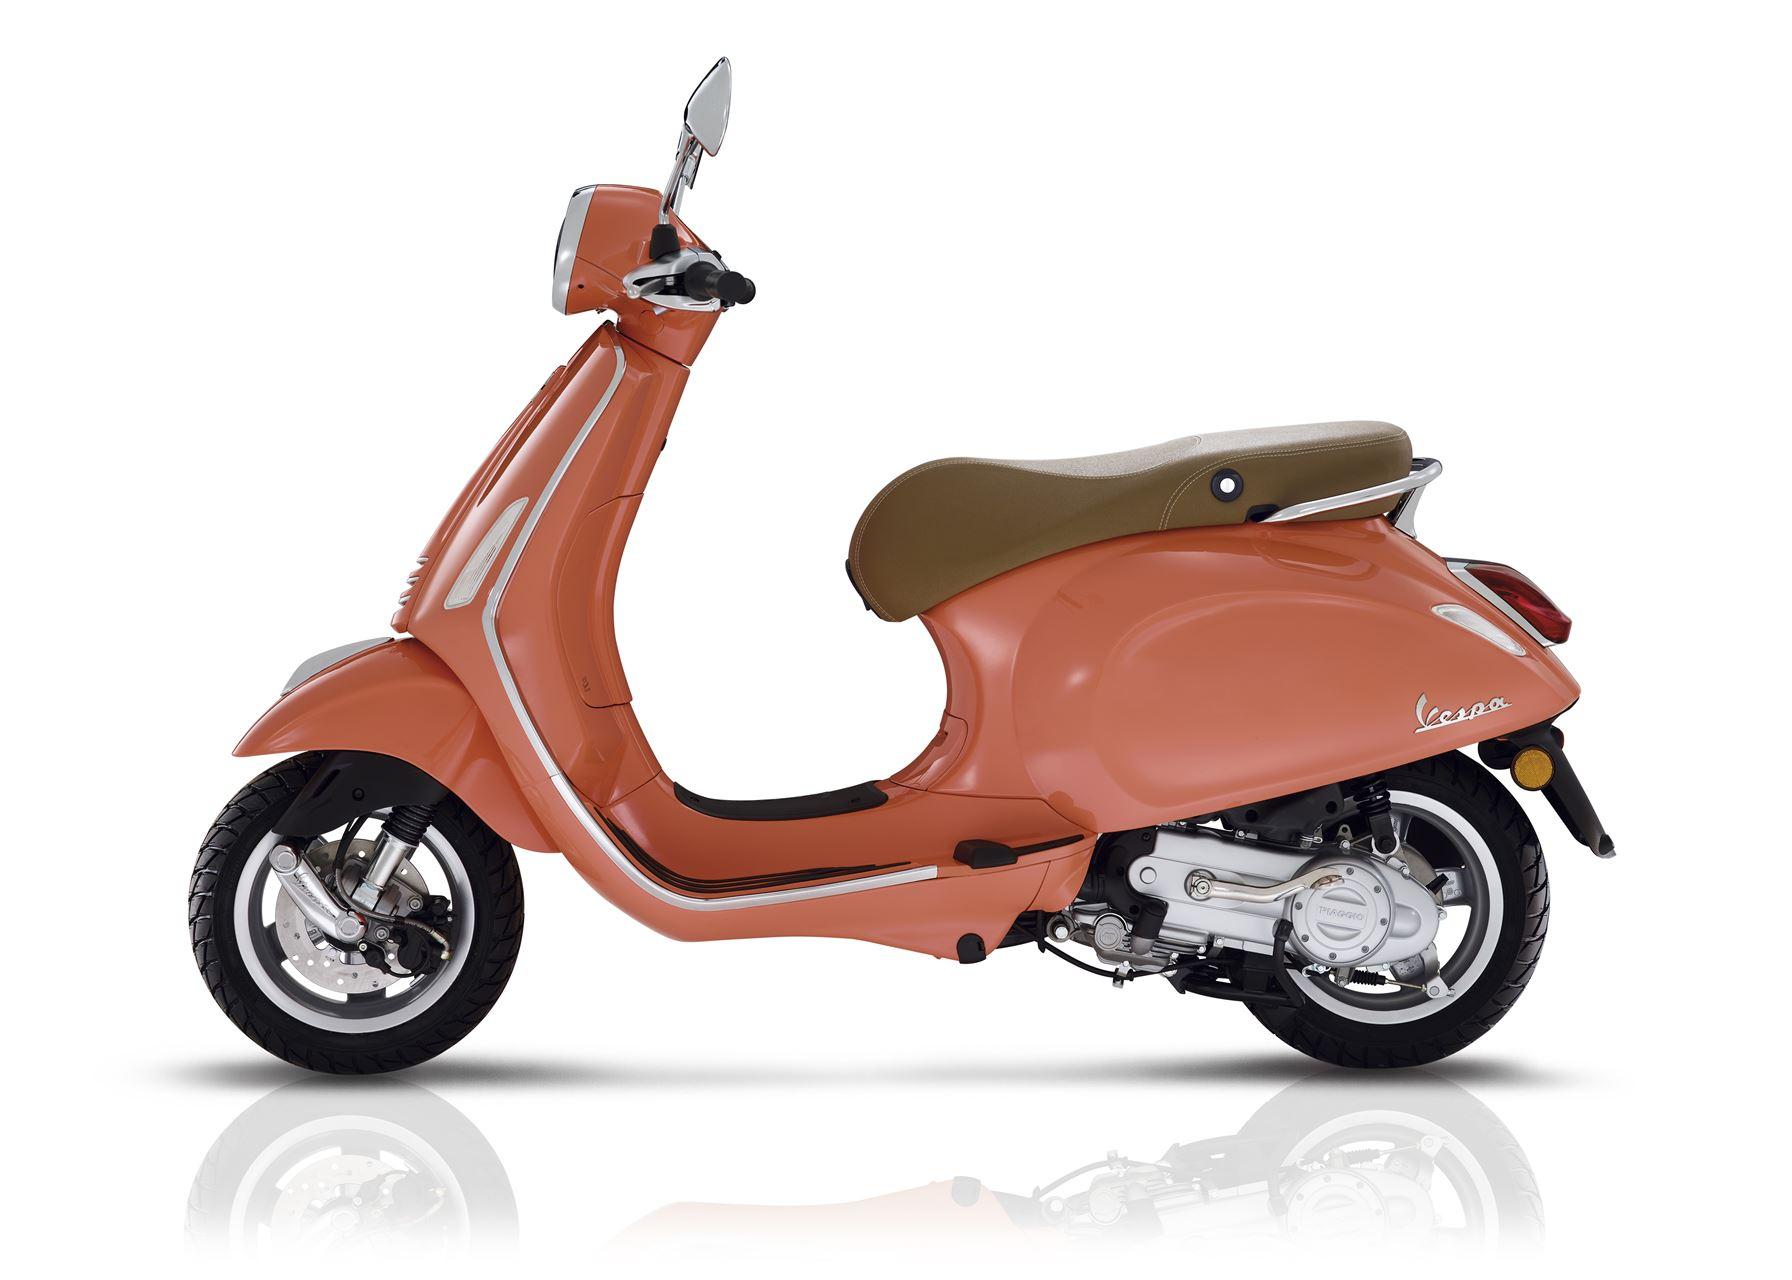 vespa primavera 50 2t scooter gama 50cc andar de moto. Black Bedroom Furniture Sets. Home Design Ideas